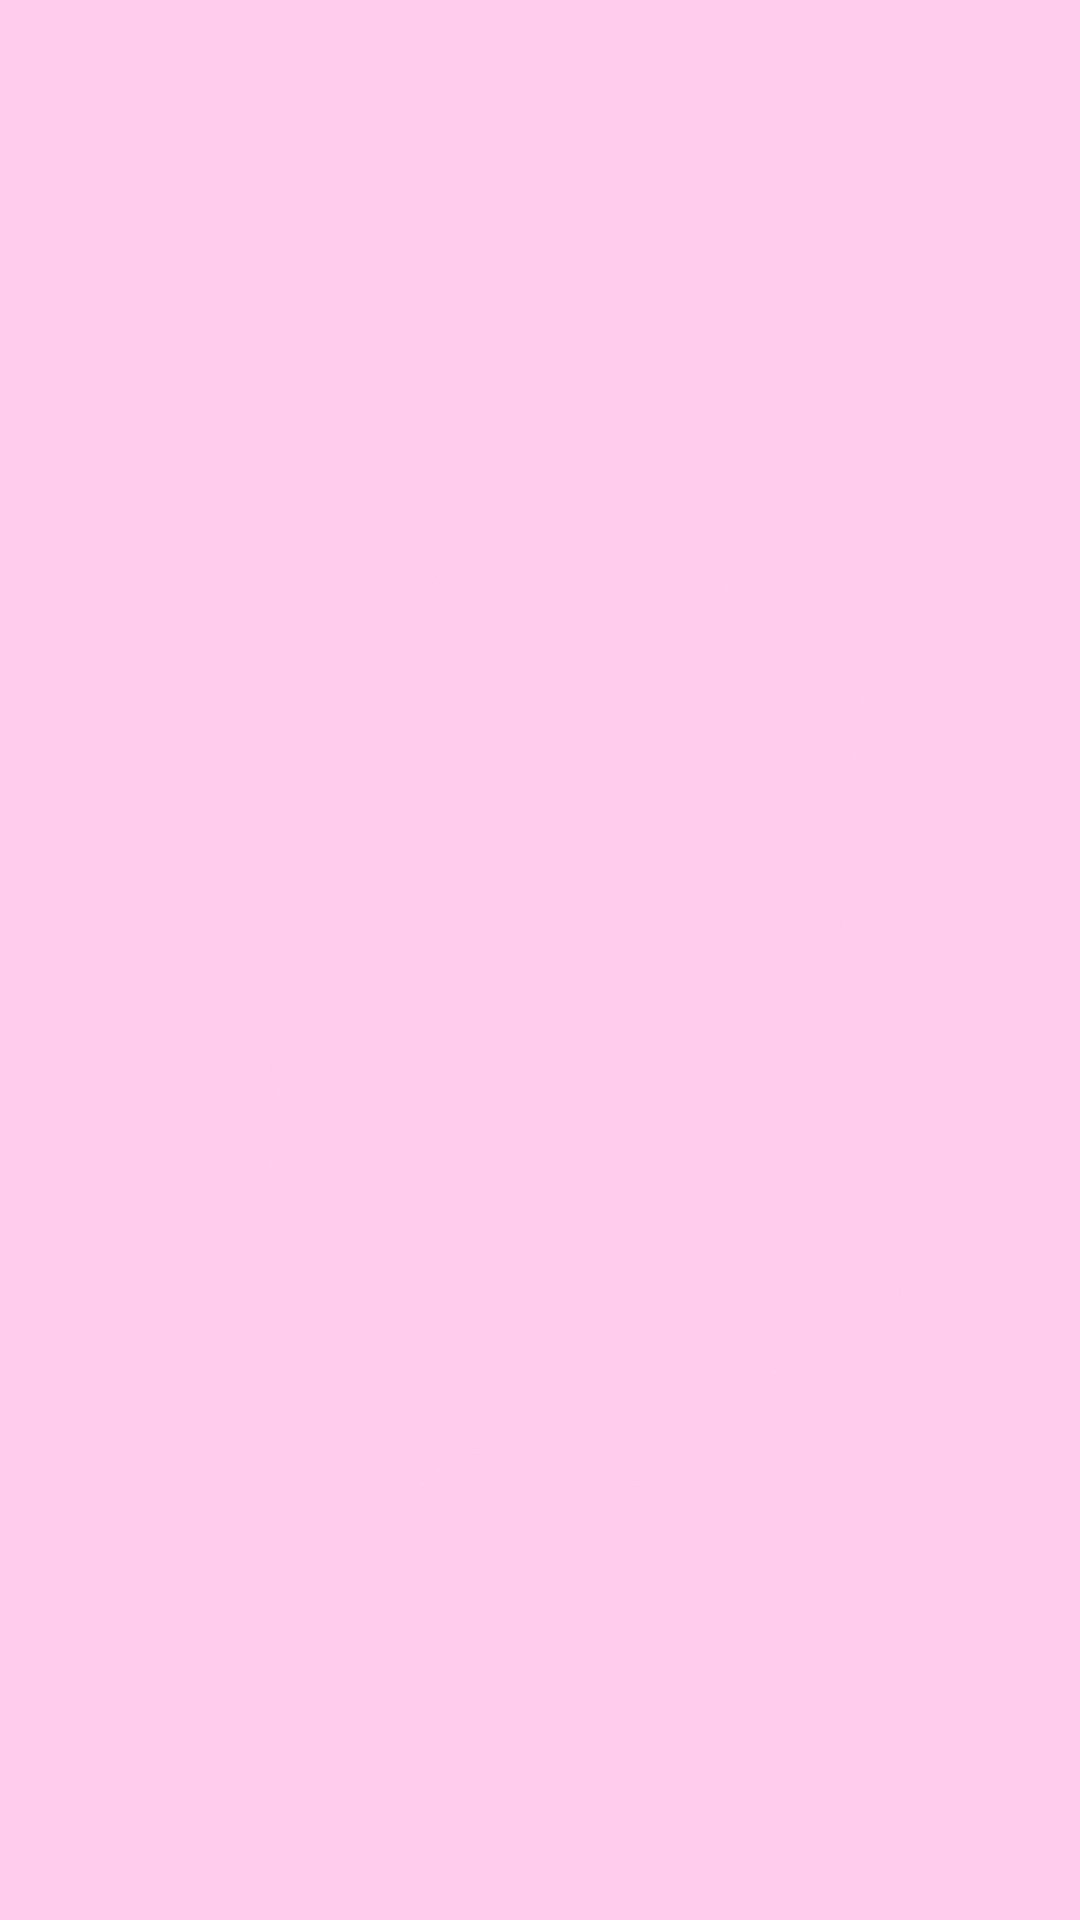 scream queens chanel oberlin chanel number one pink tv show fox lockscreens  scream queens lockscreen ariana